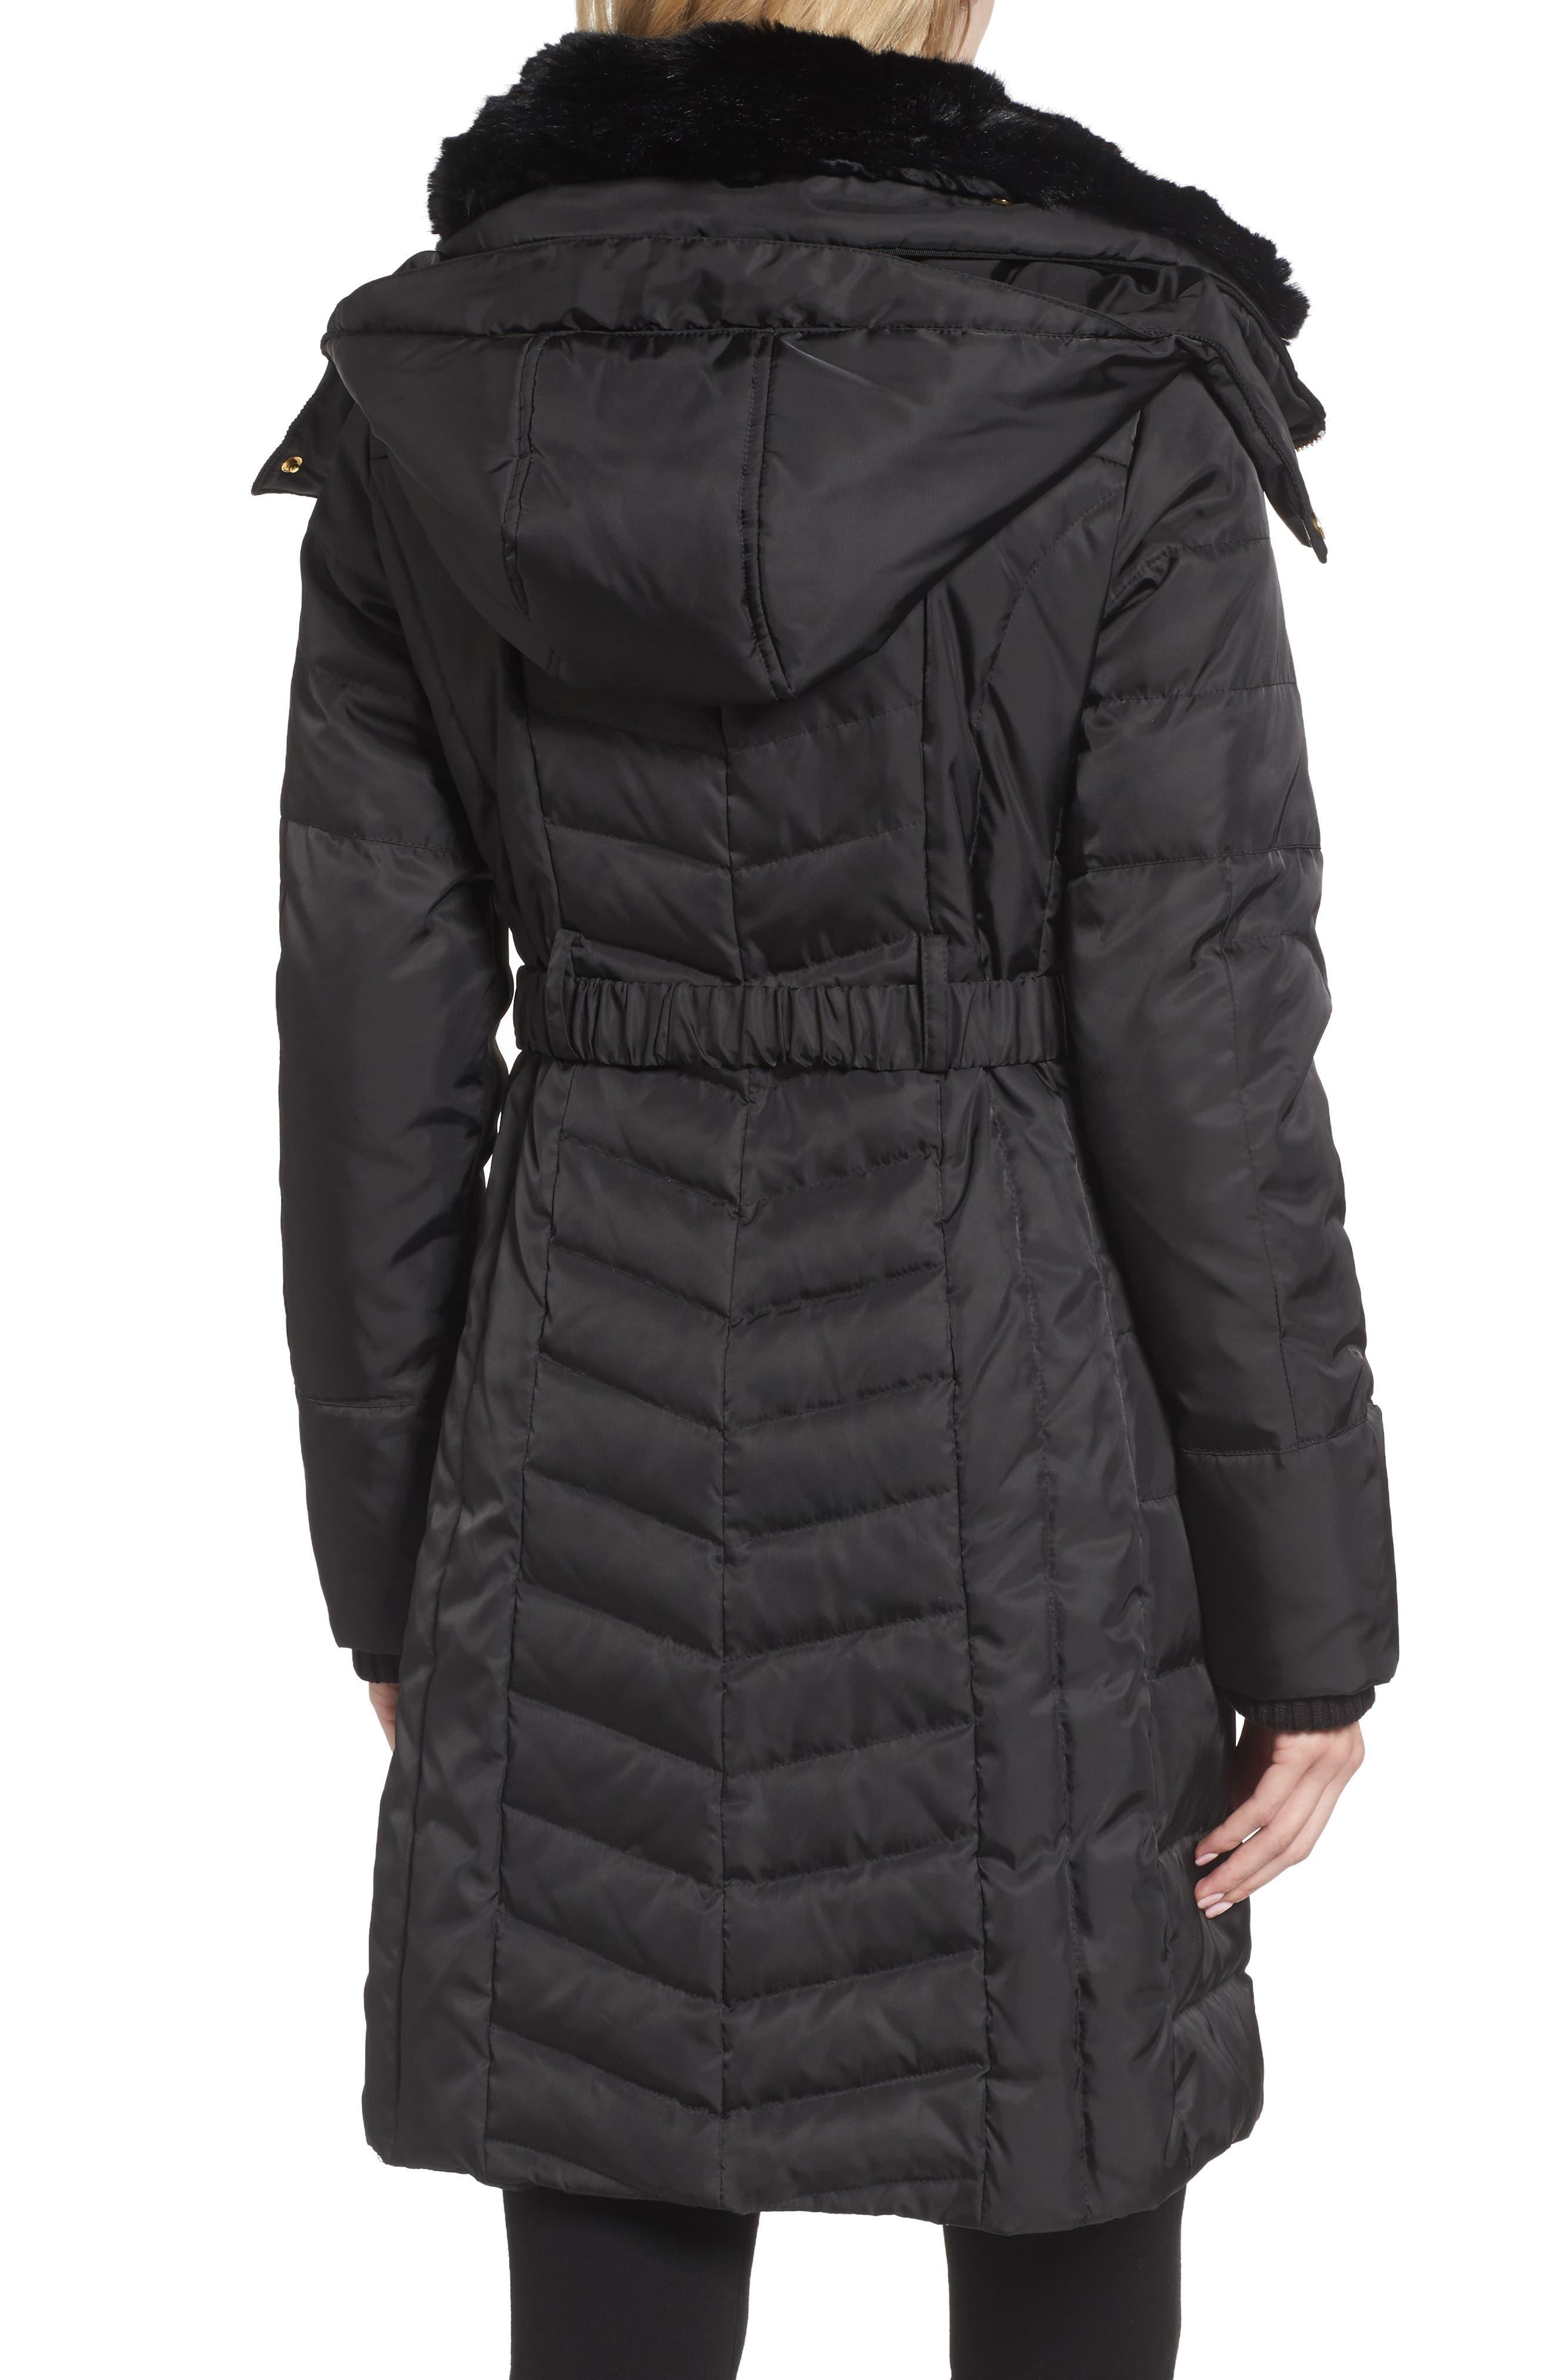 Belted Coat with Detachable Faux Fur,                             Alternate thumbnail 2, color,                             001